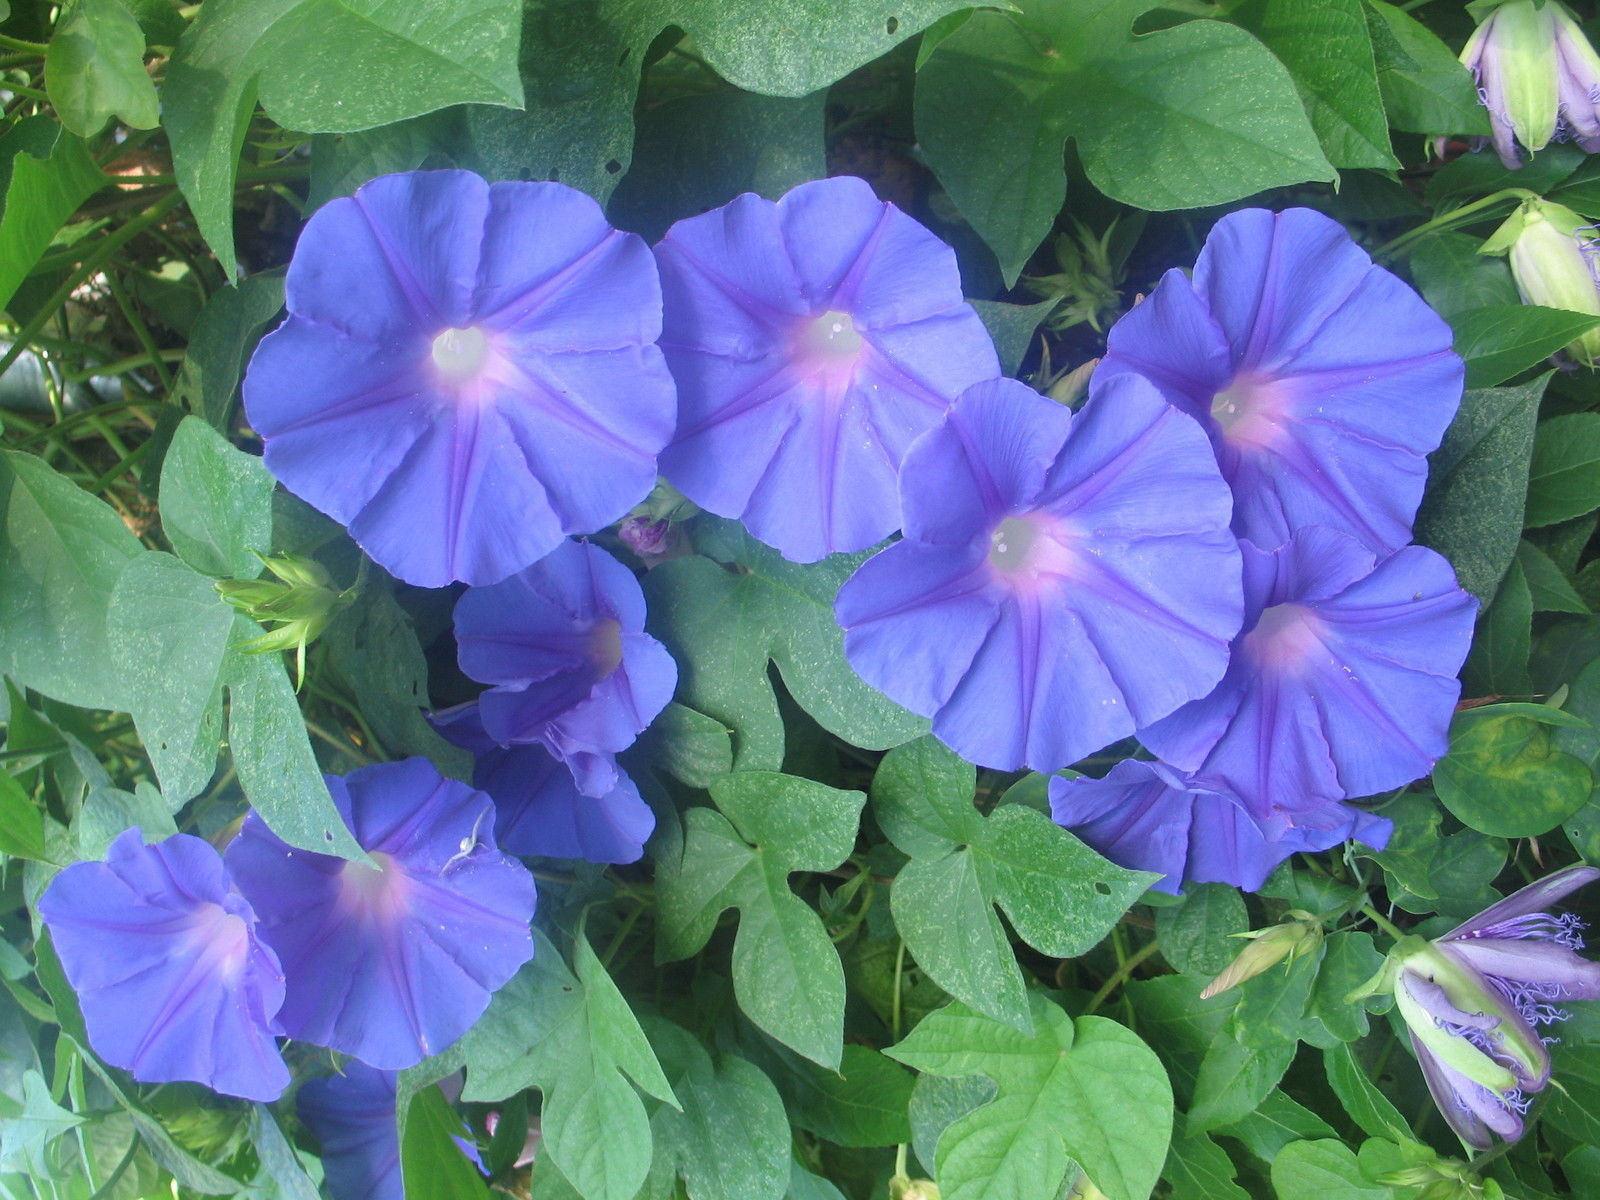 Morning glory acuminata blue dawn perennial plant free ship etsy image 0 image 1 izmirmasajfo